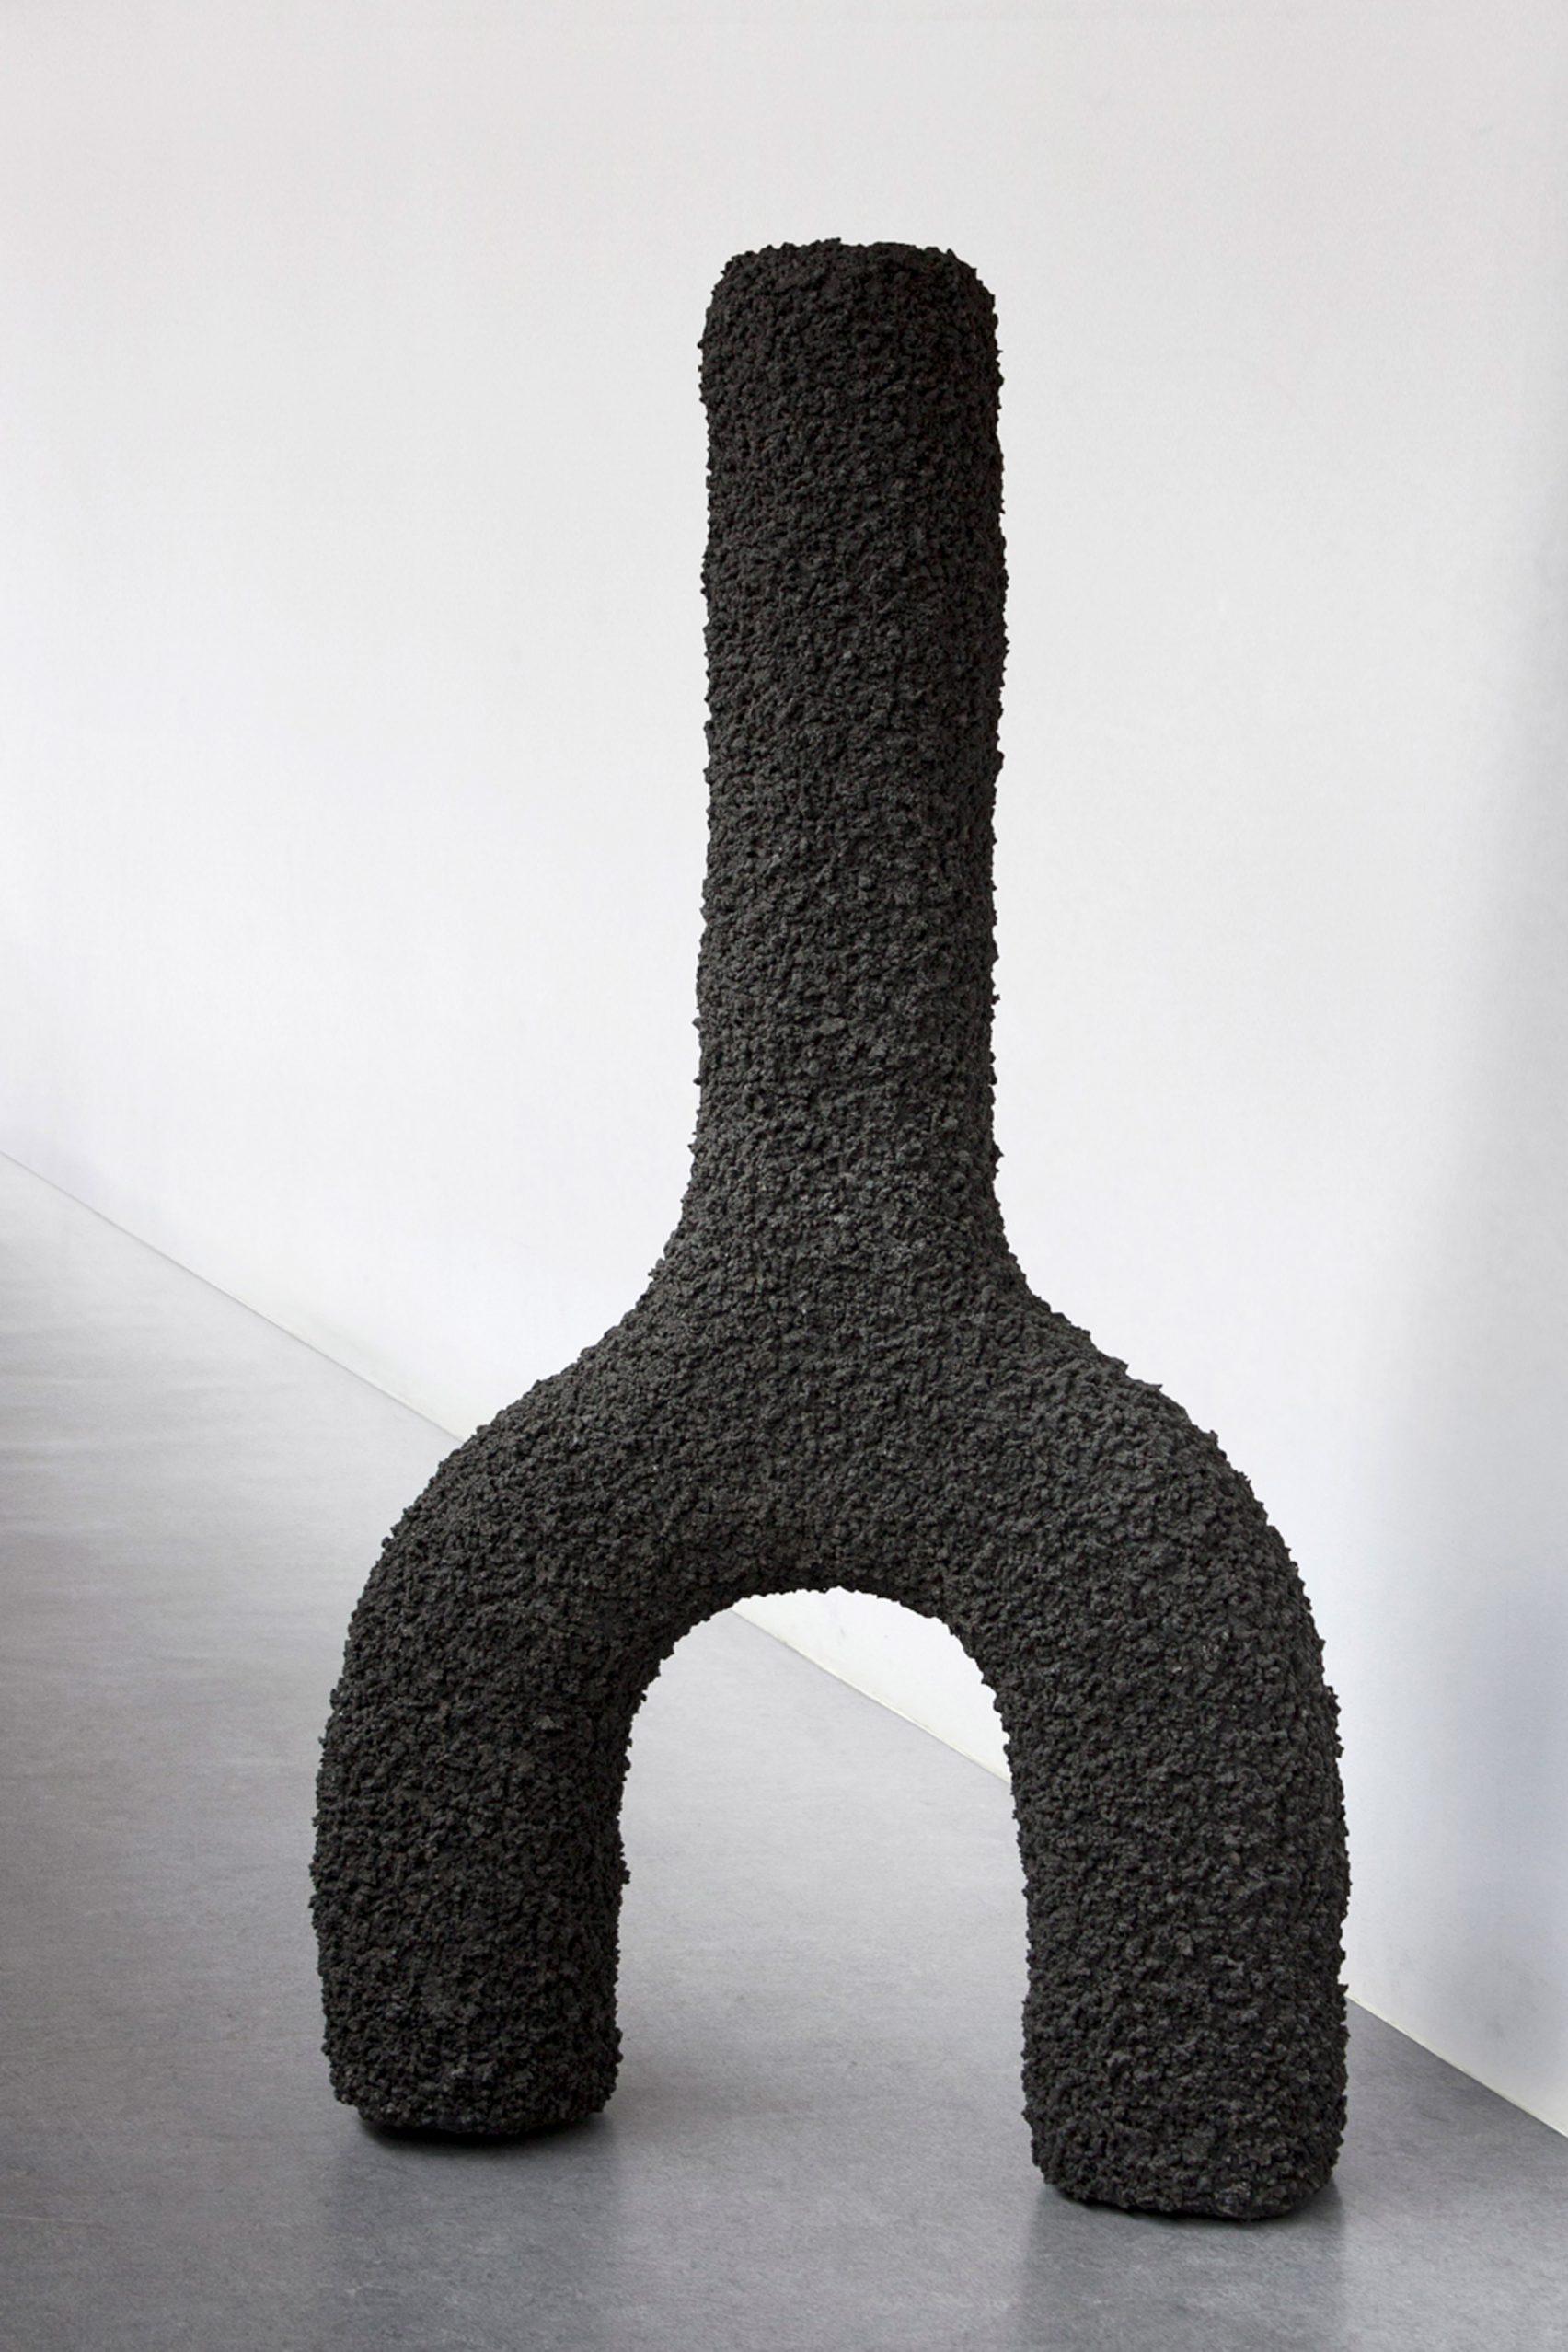 tactile-monoliths-by-stine-mikkelsen_dezeen_2364_col_3-1704x2556.jpg